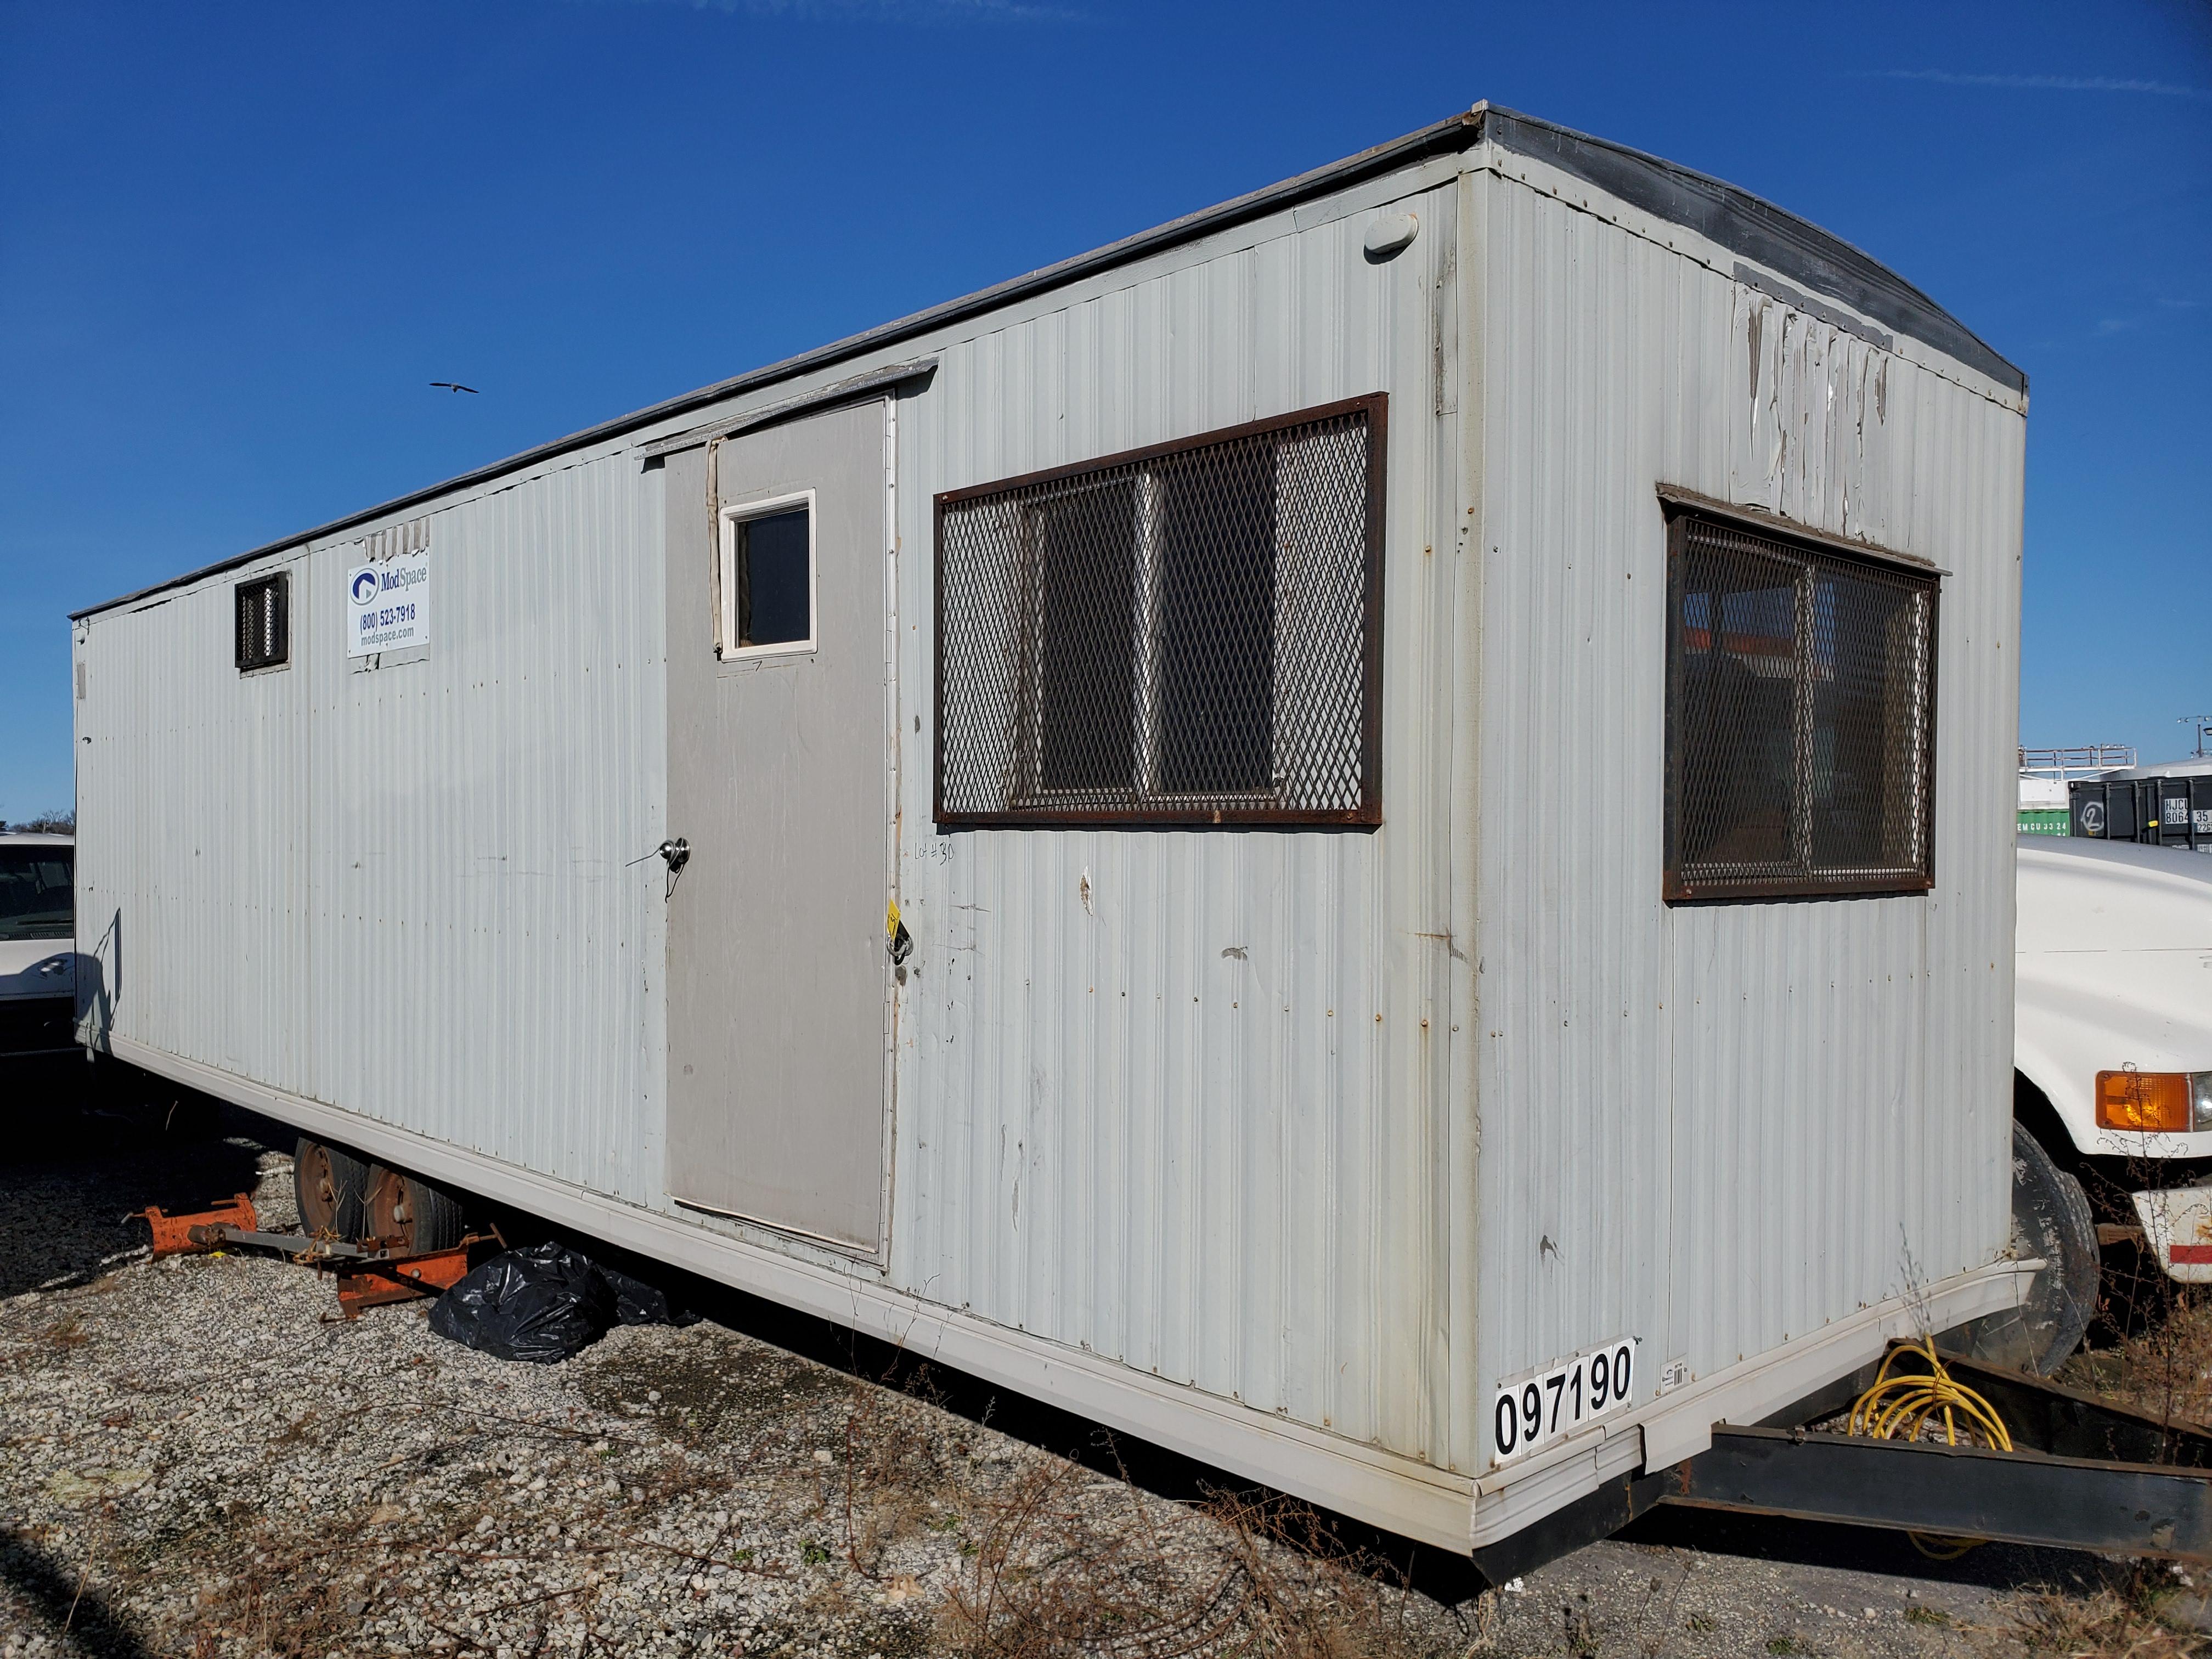 Lot 31 - 28' LONG MODULAR OFFICE TRAILER, DUAL AXLE, 2-DOOR, WINDOWS, ETC. [LOCATED @ 6 CANAL ROAD, PELHAM,